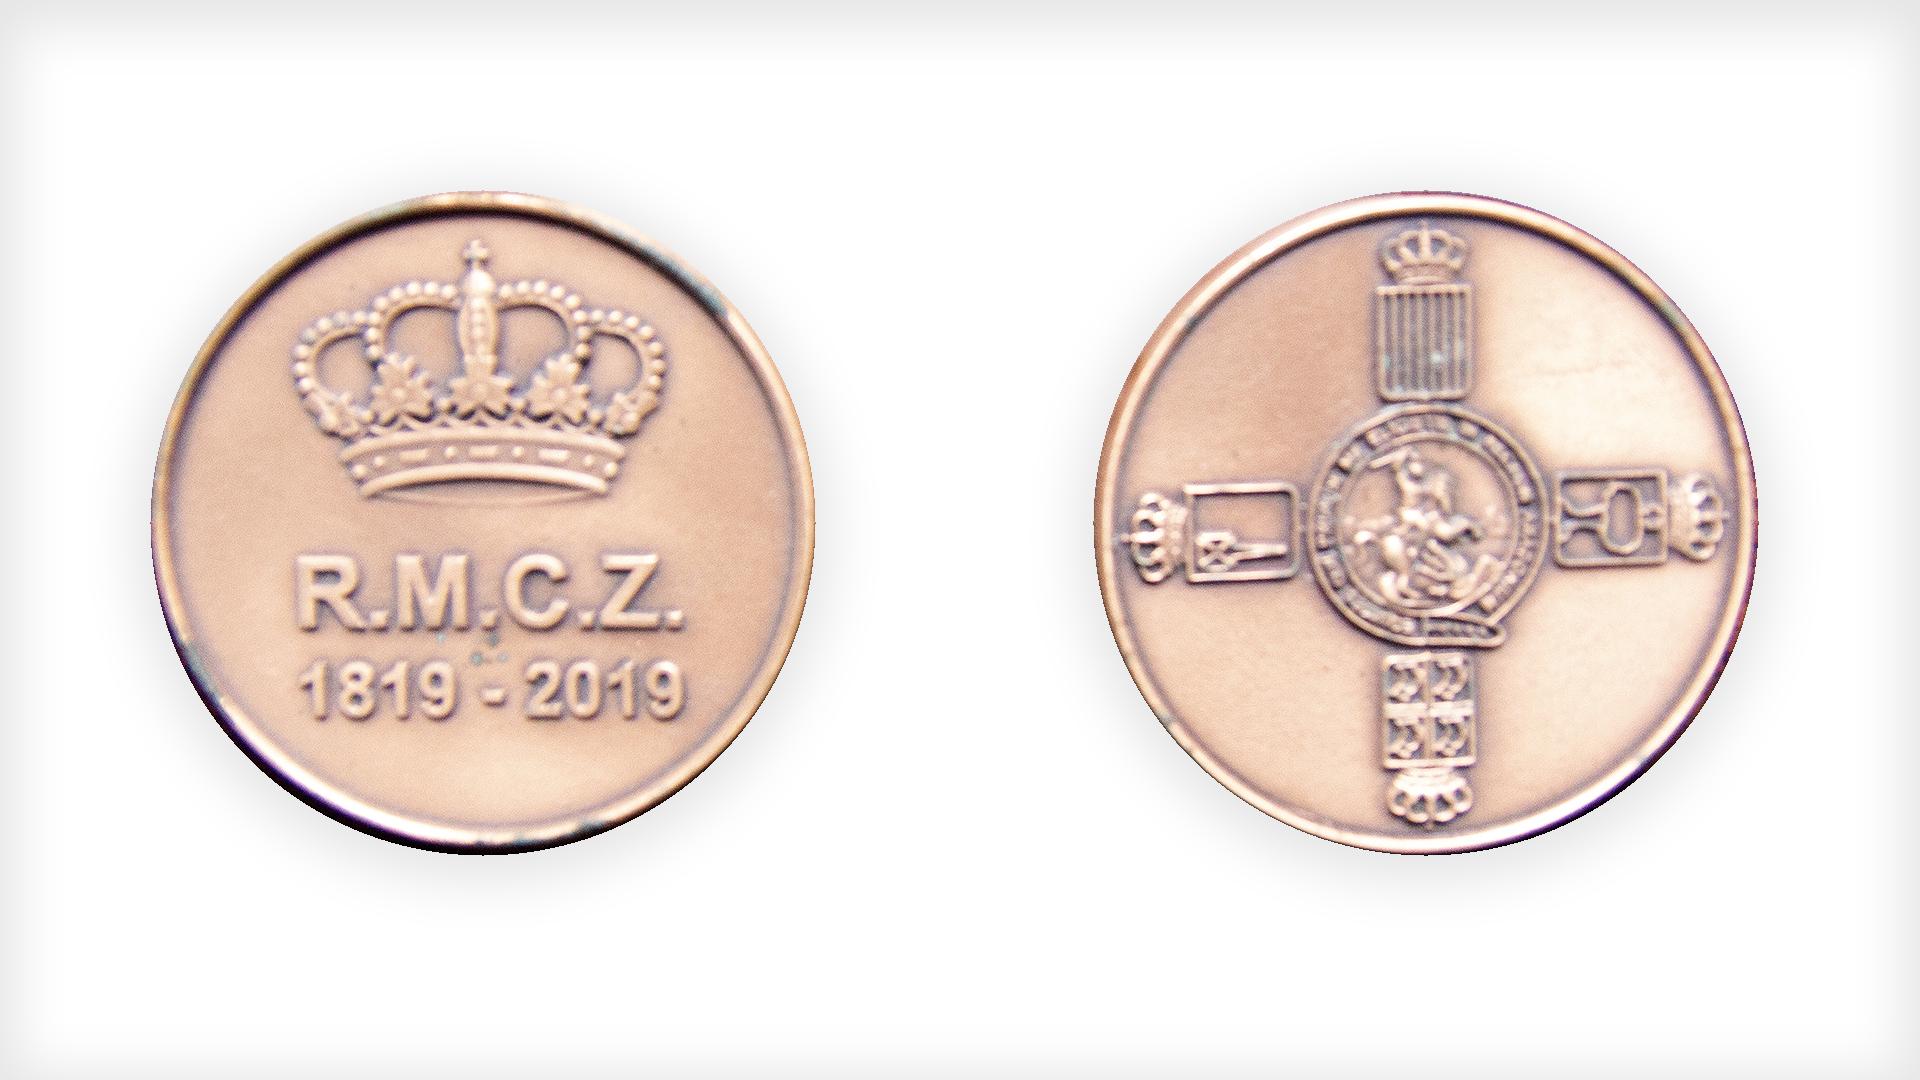 RMCZ moneda conmemorativa